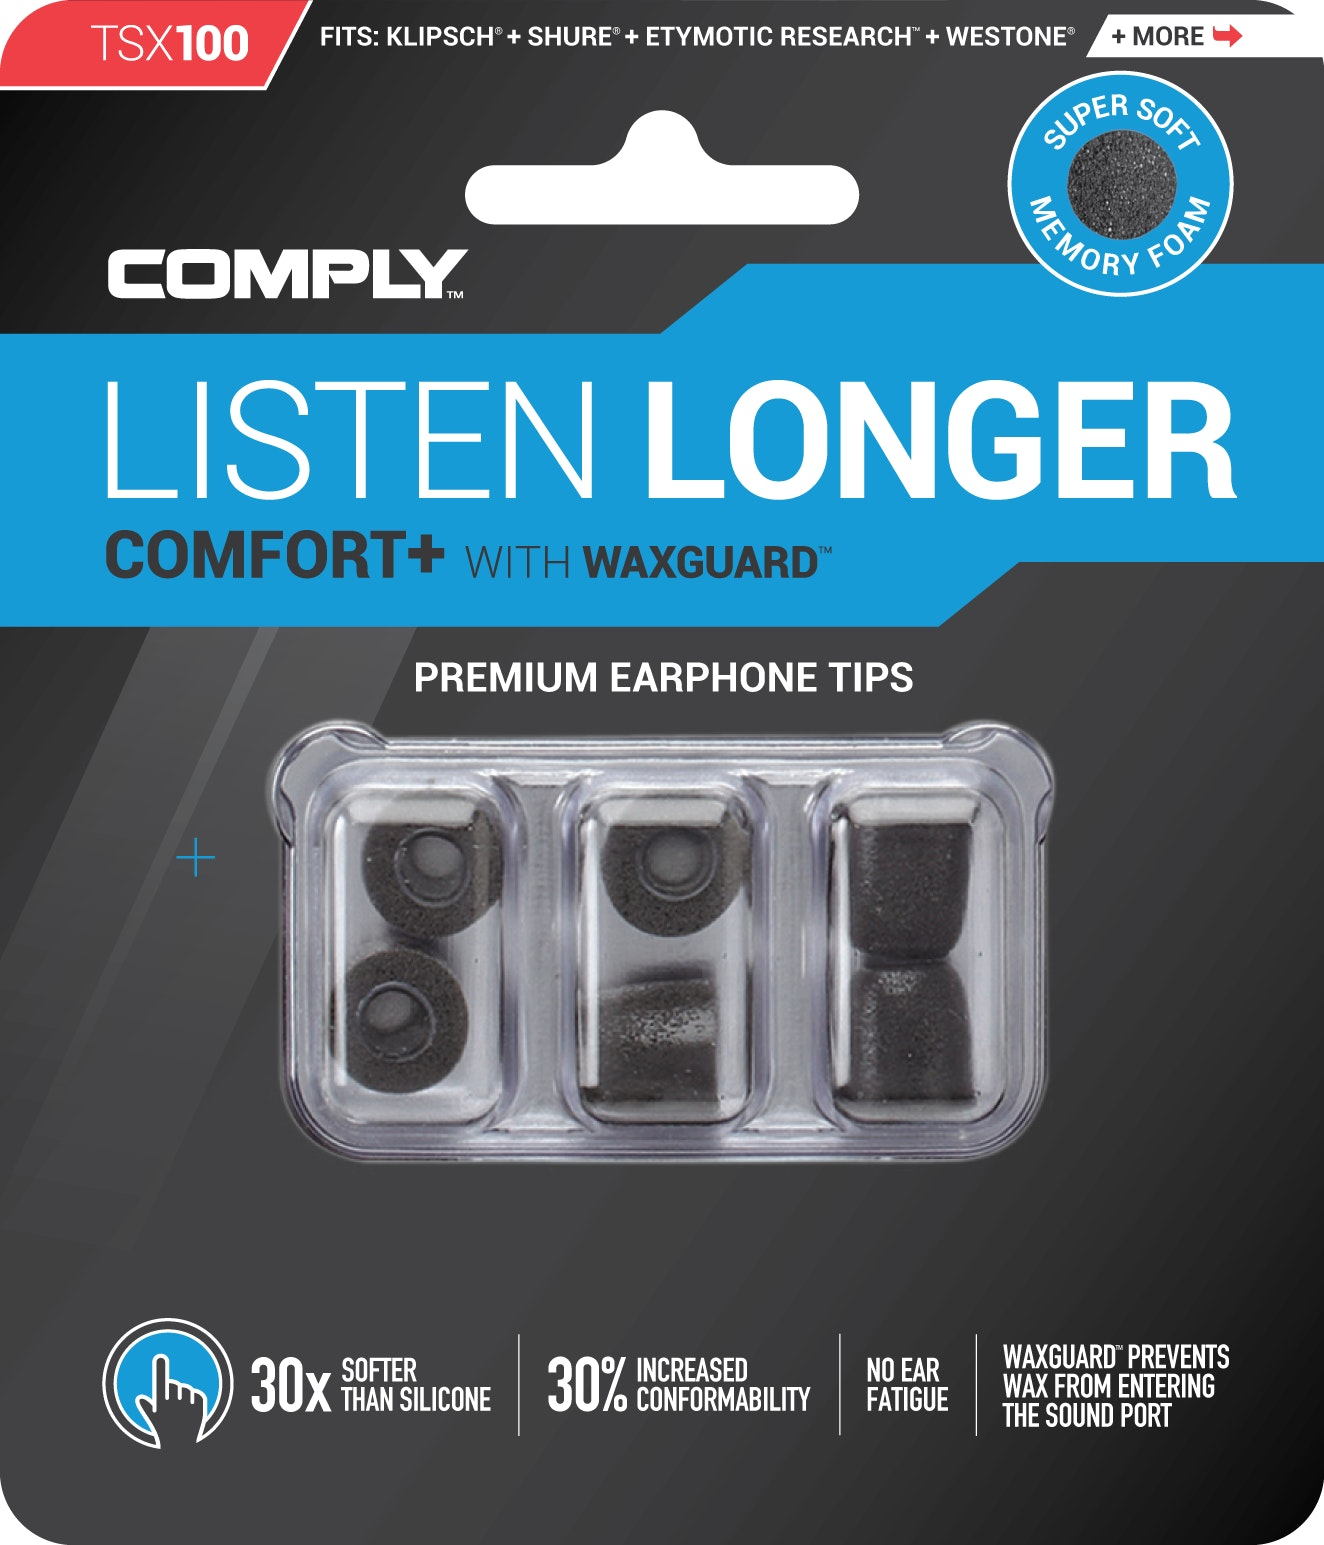 Comfort Plus - TSX